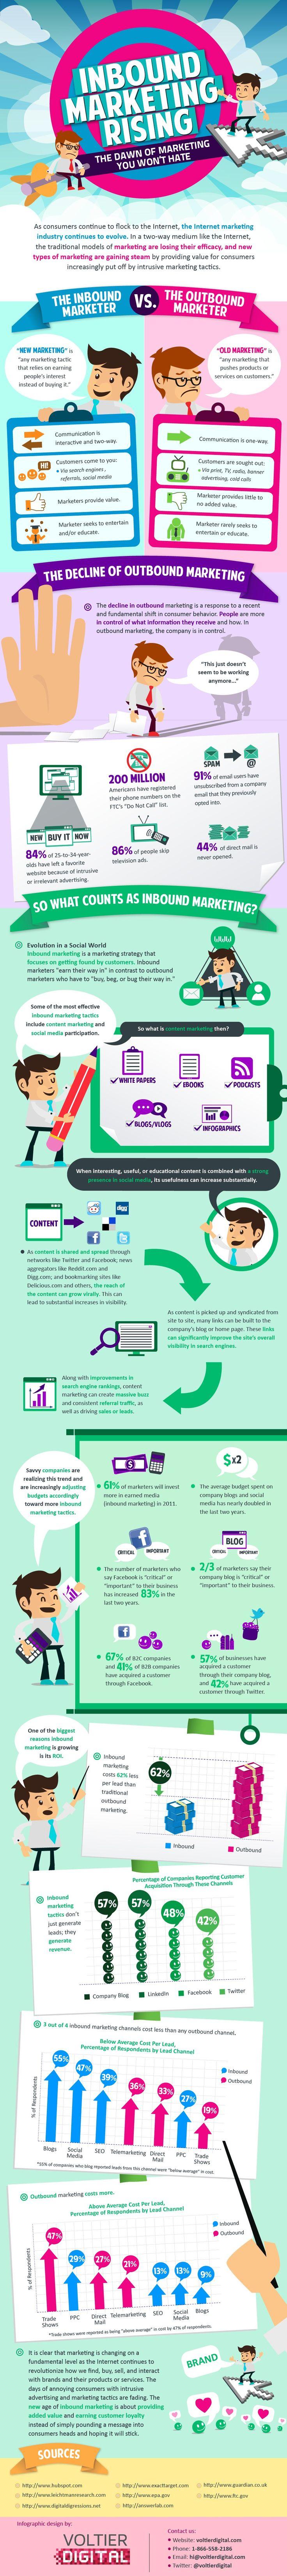 Inbound Маркетинг vs. Outbound Маркетинг [Инфографика] » TechStationBG